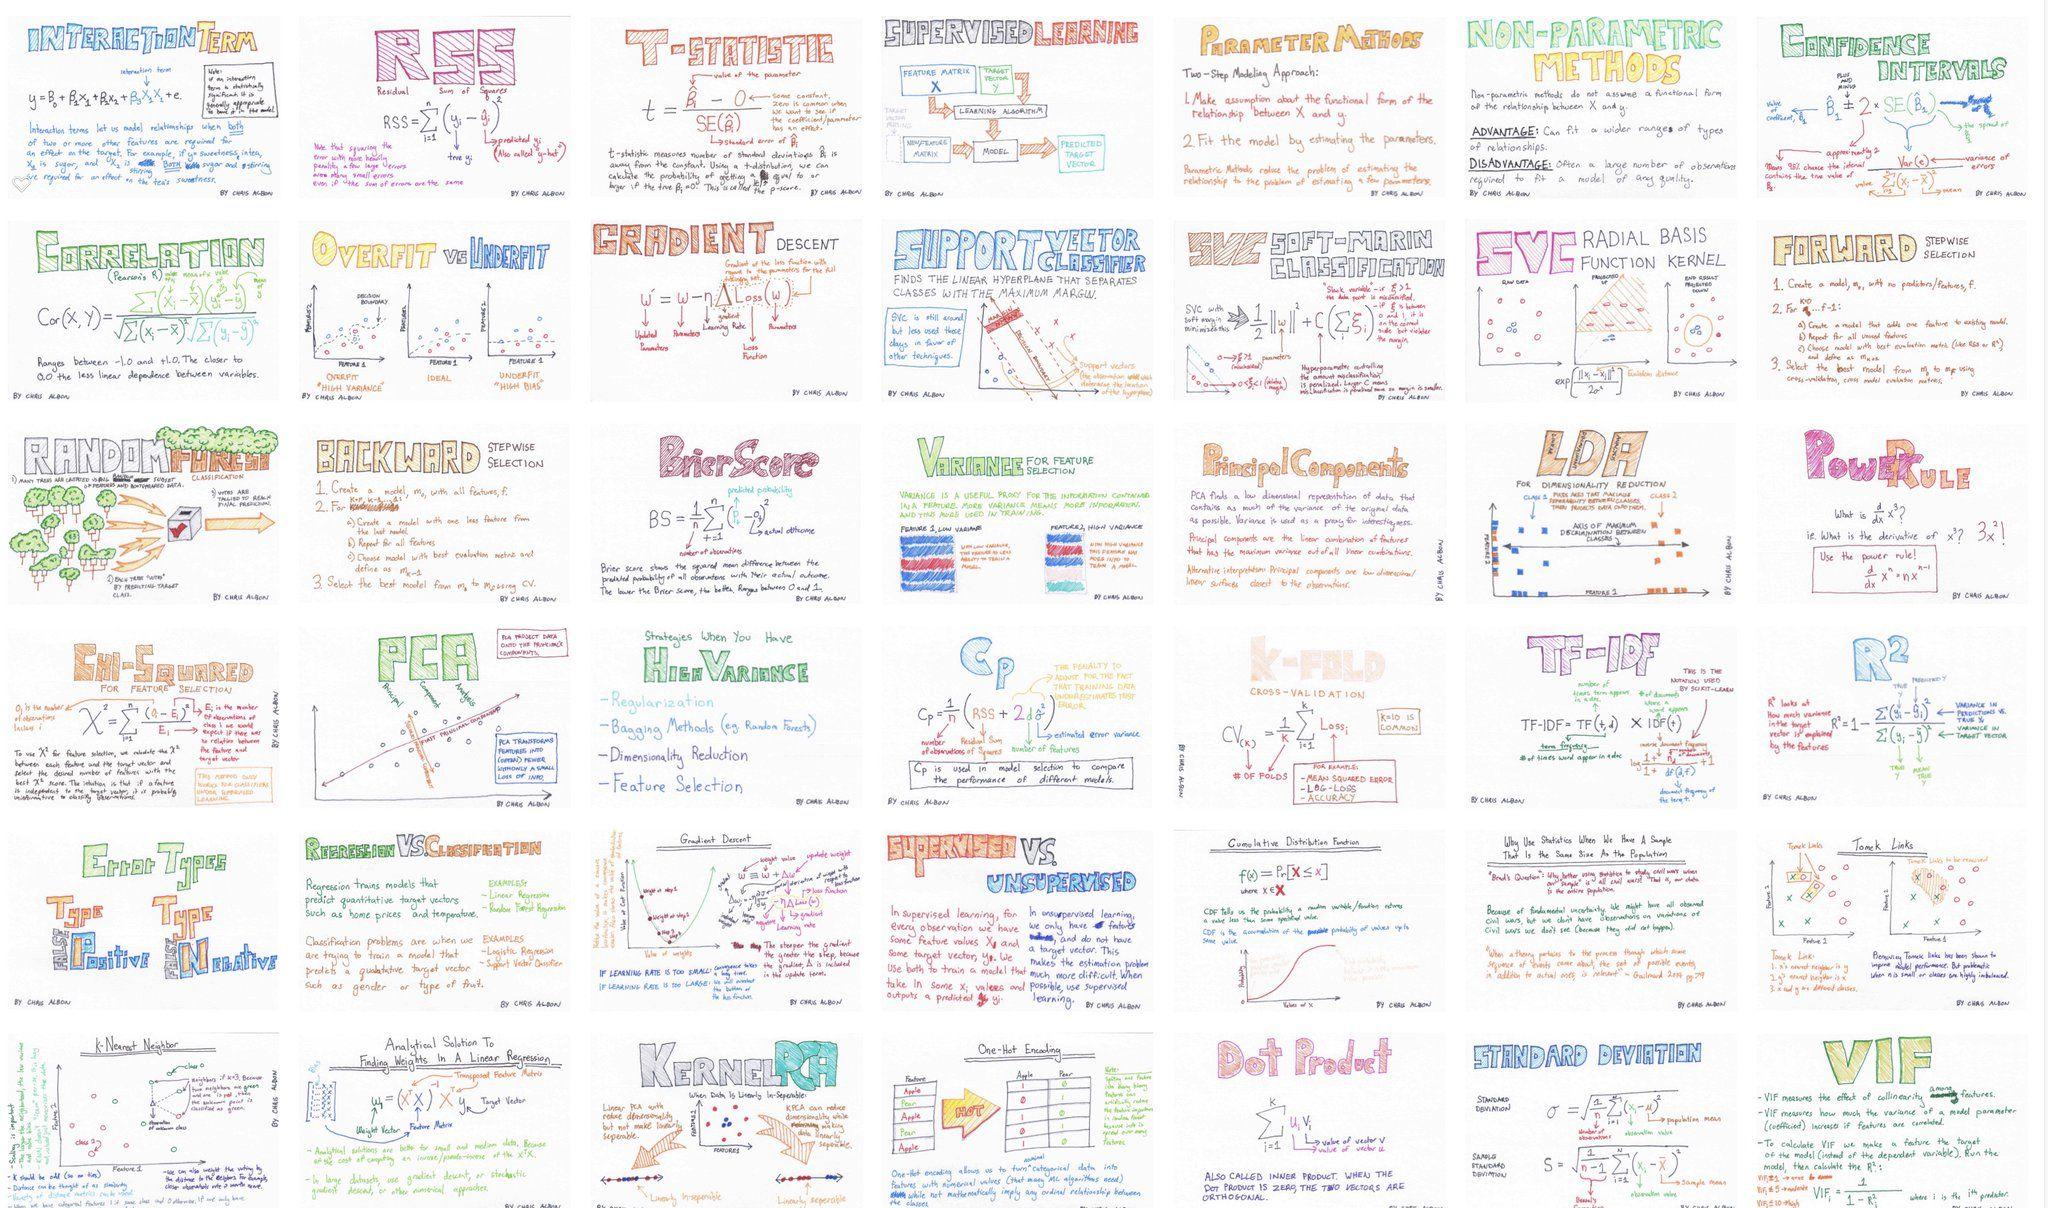 Chris Albon on | Inspiring Ideas | Data science, Big data